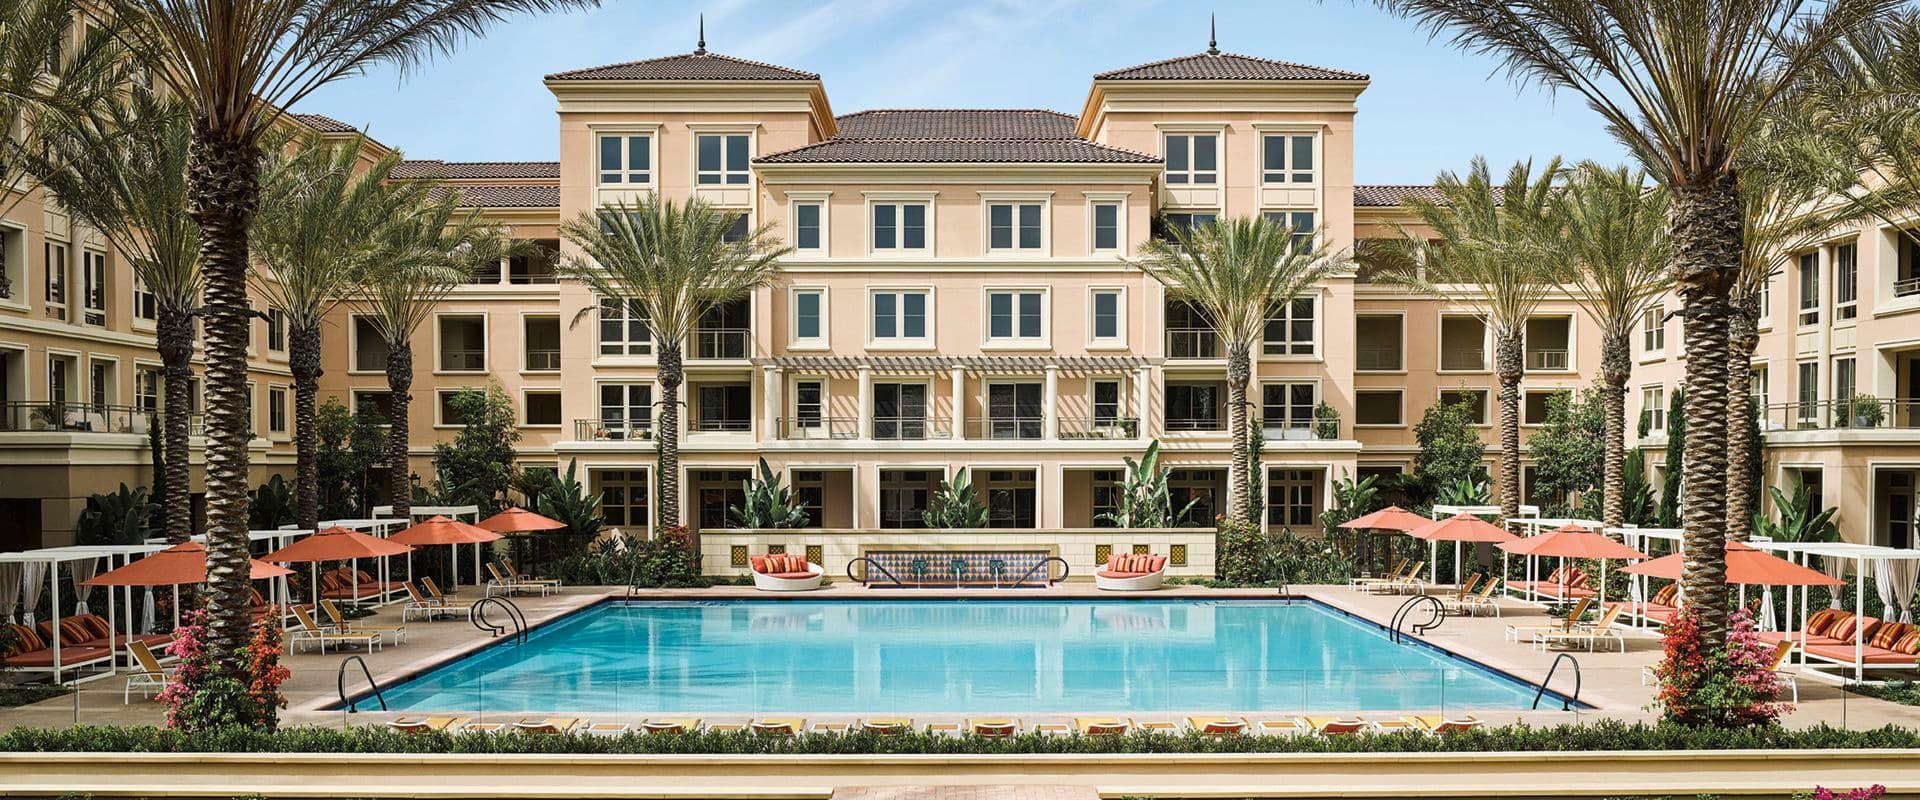 Pool view of Villas Fashion Island Apartment Homes in Newport Beach, CA.